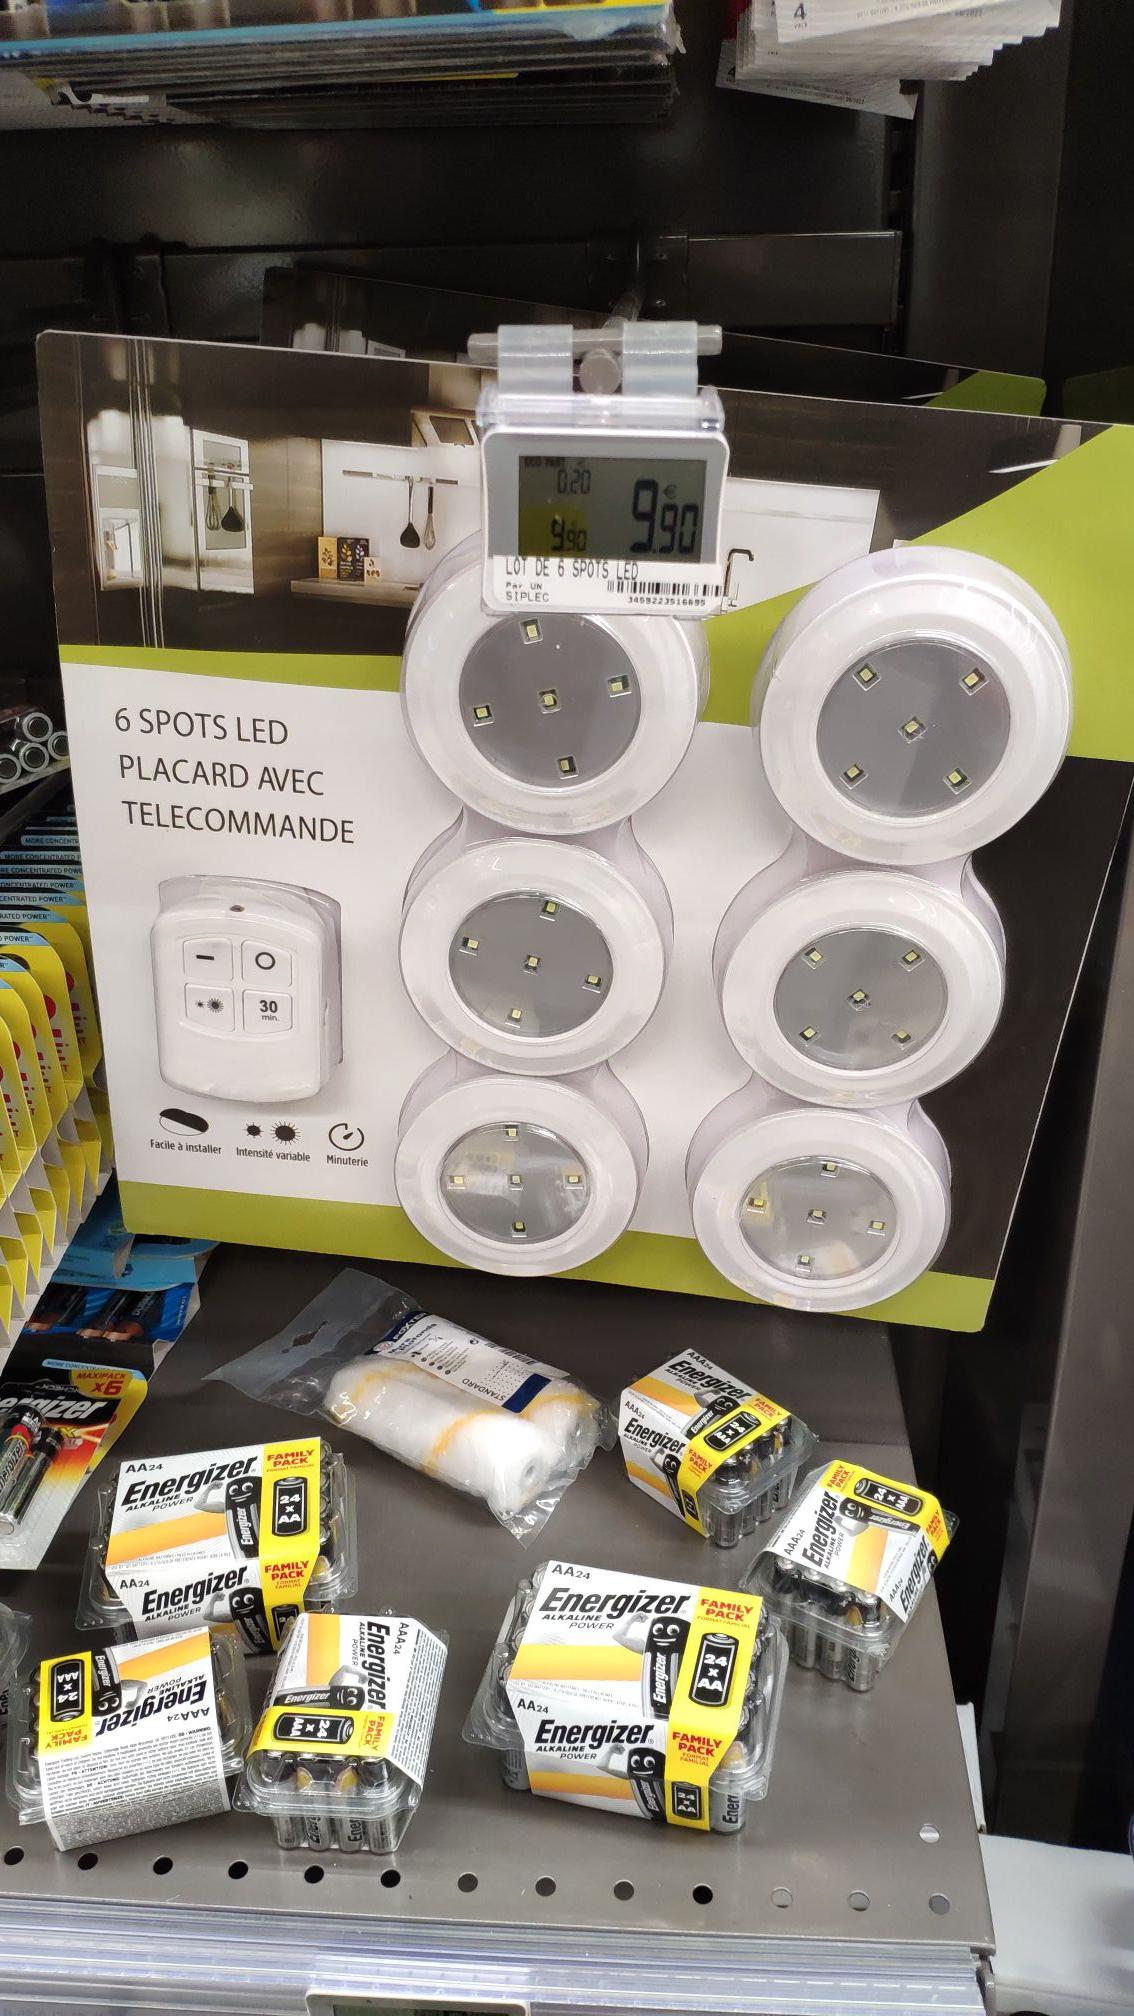 6 Spots LED + Télécommande (Saint Chamond 42)